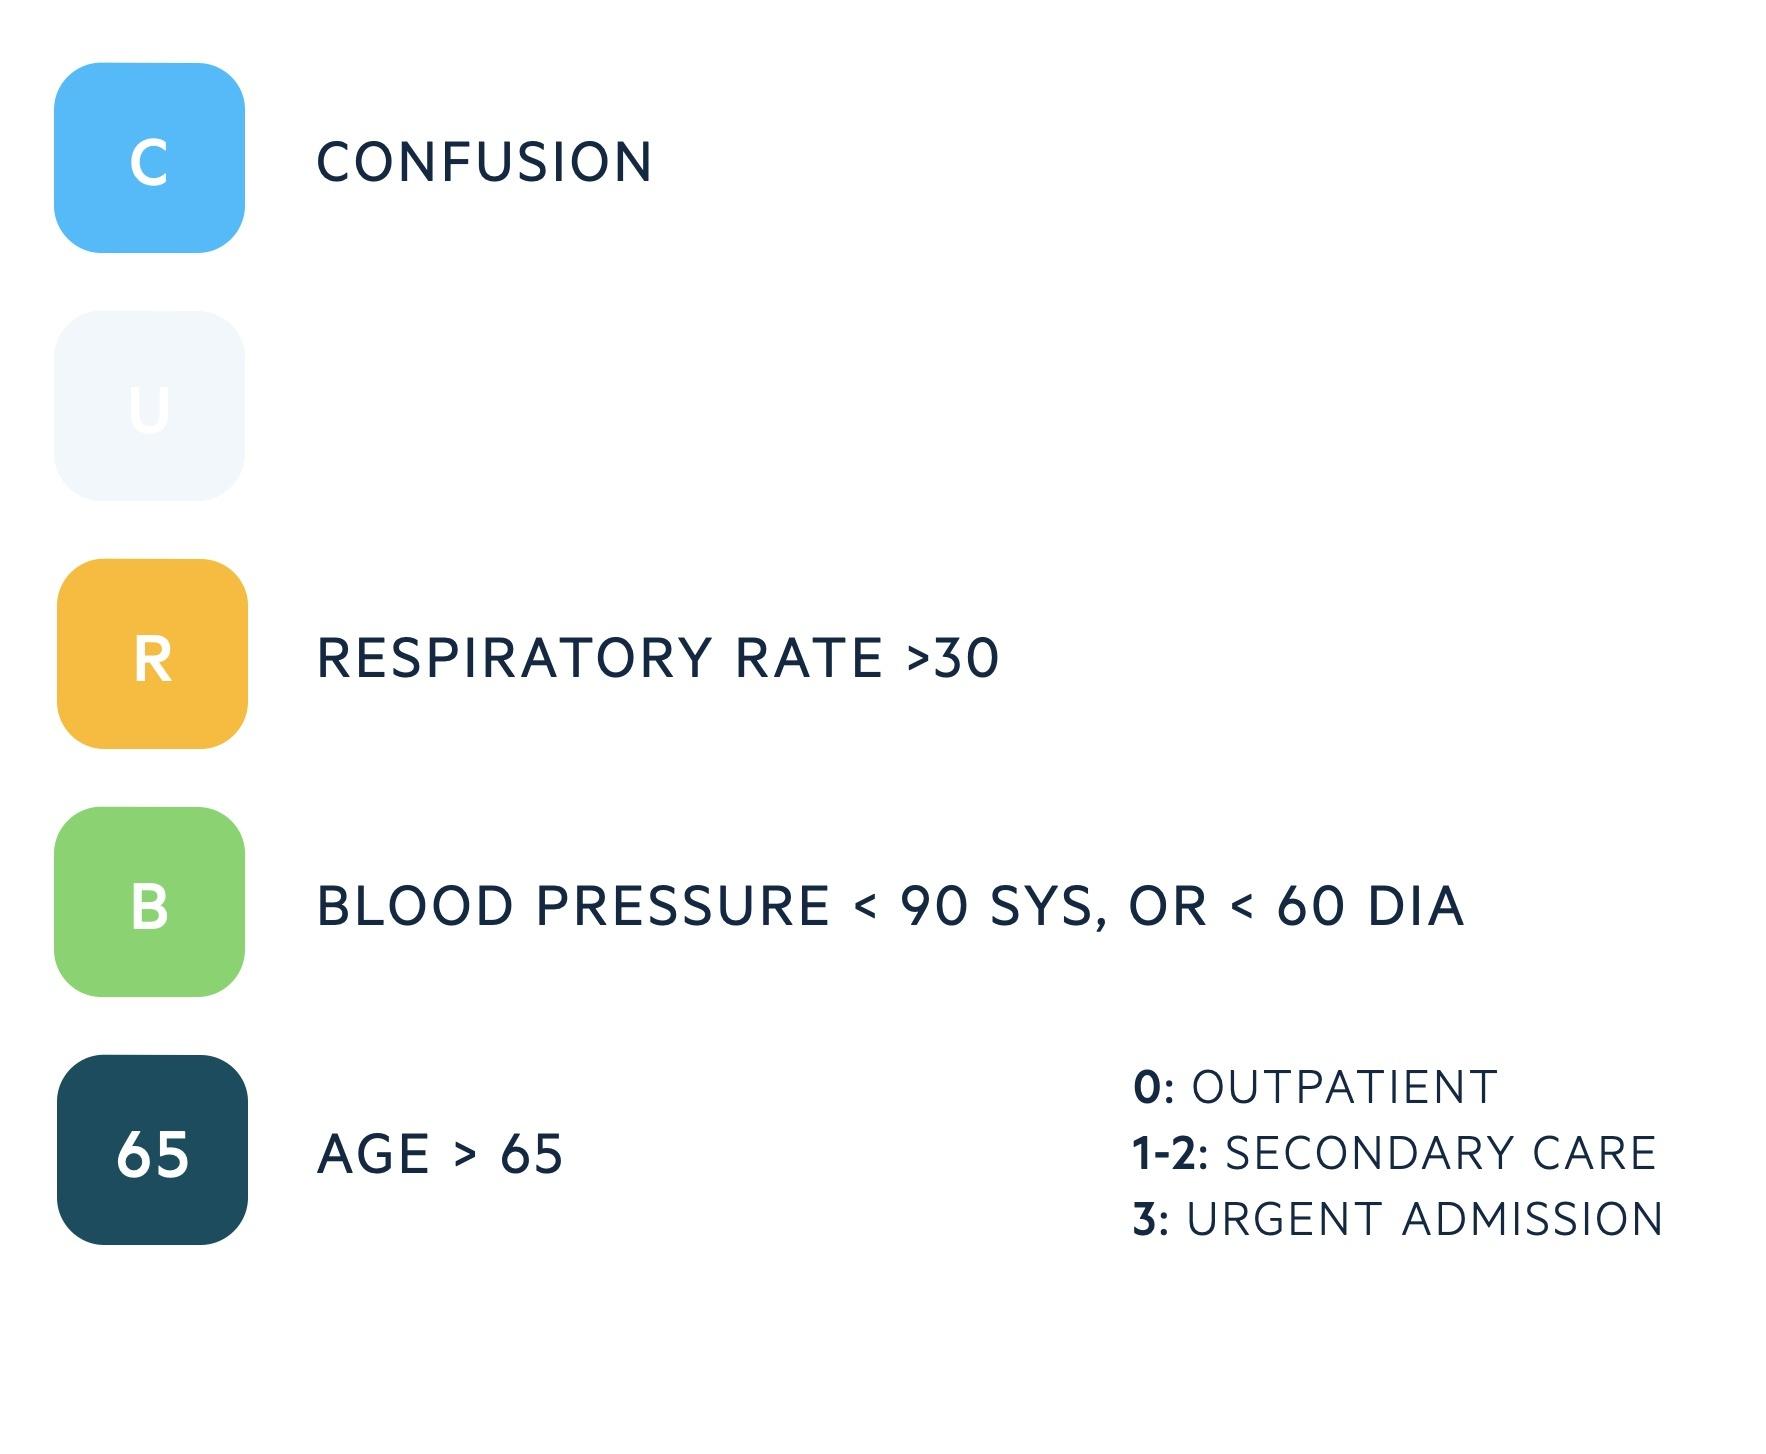 CRB-65 for pneumonia